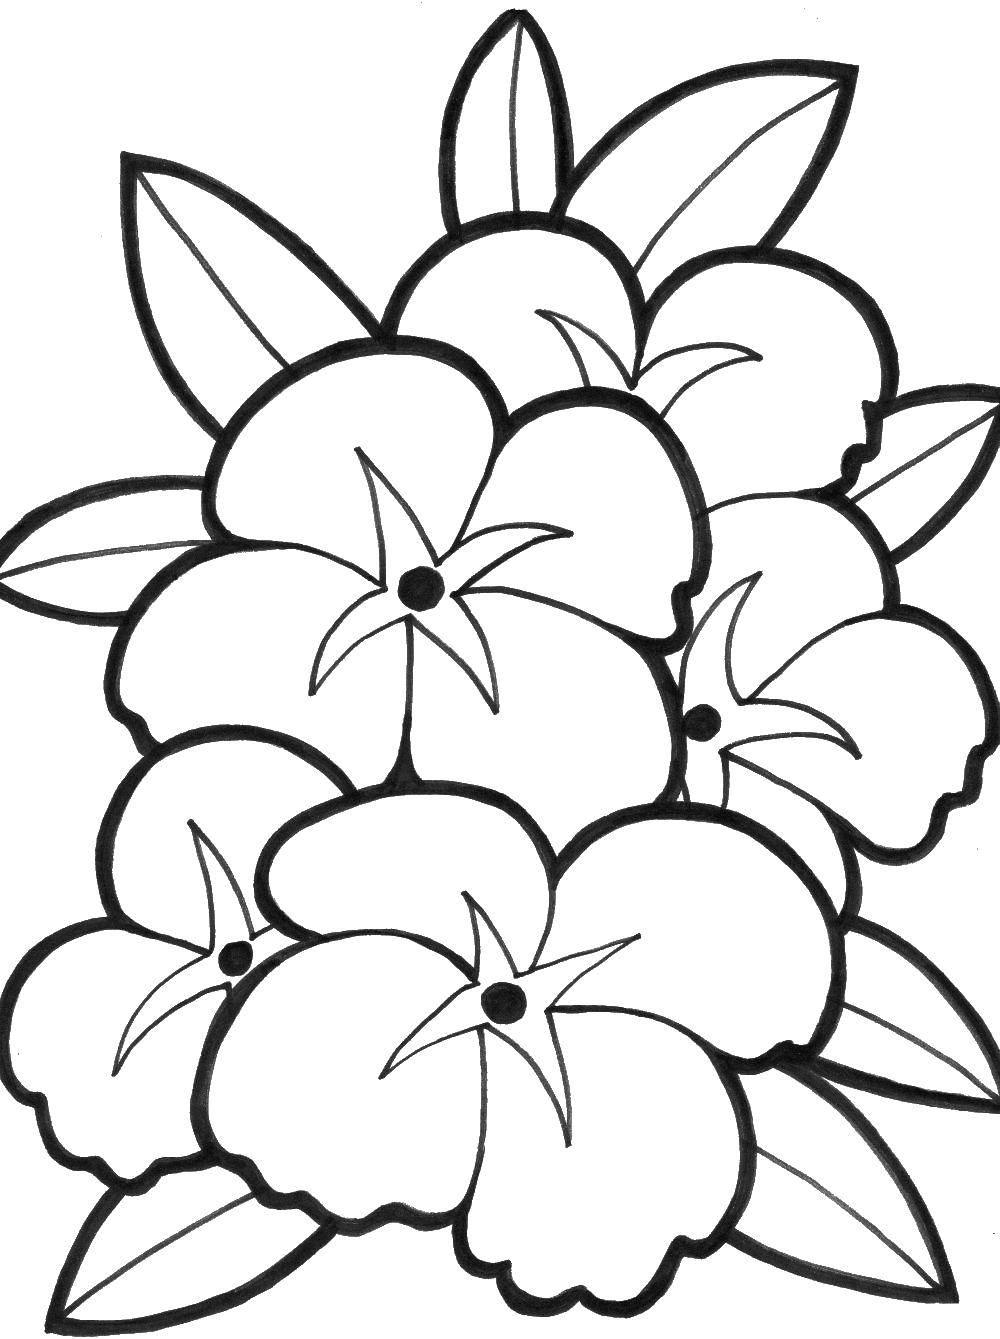 Coloring sheet flowers Download games, Tom, Ben.  Print ,coloring,